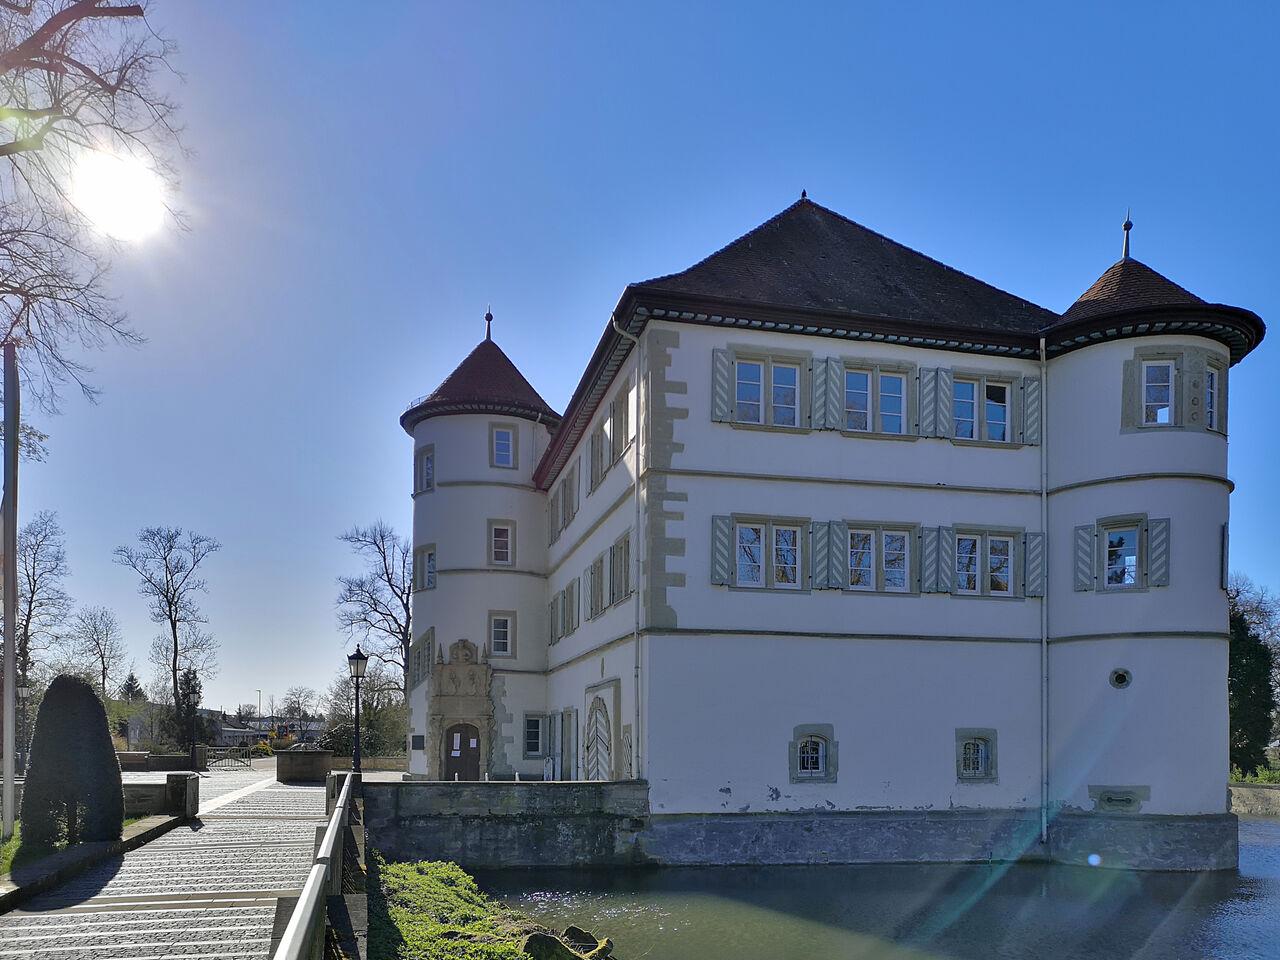 20200322_Schlosspark_in_Bad_Rappenau_005